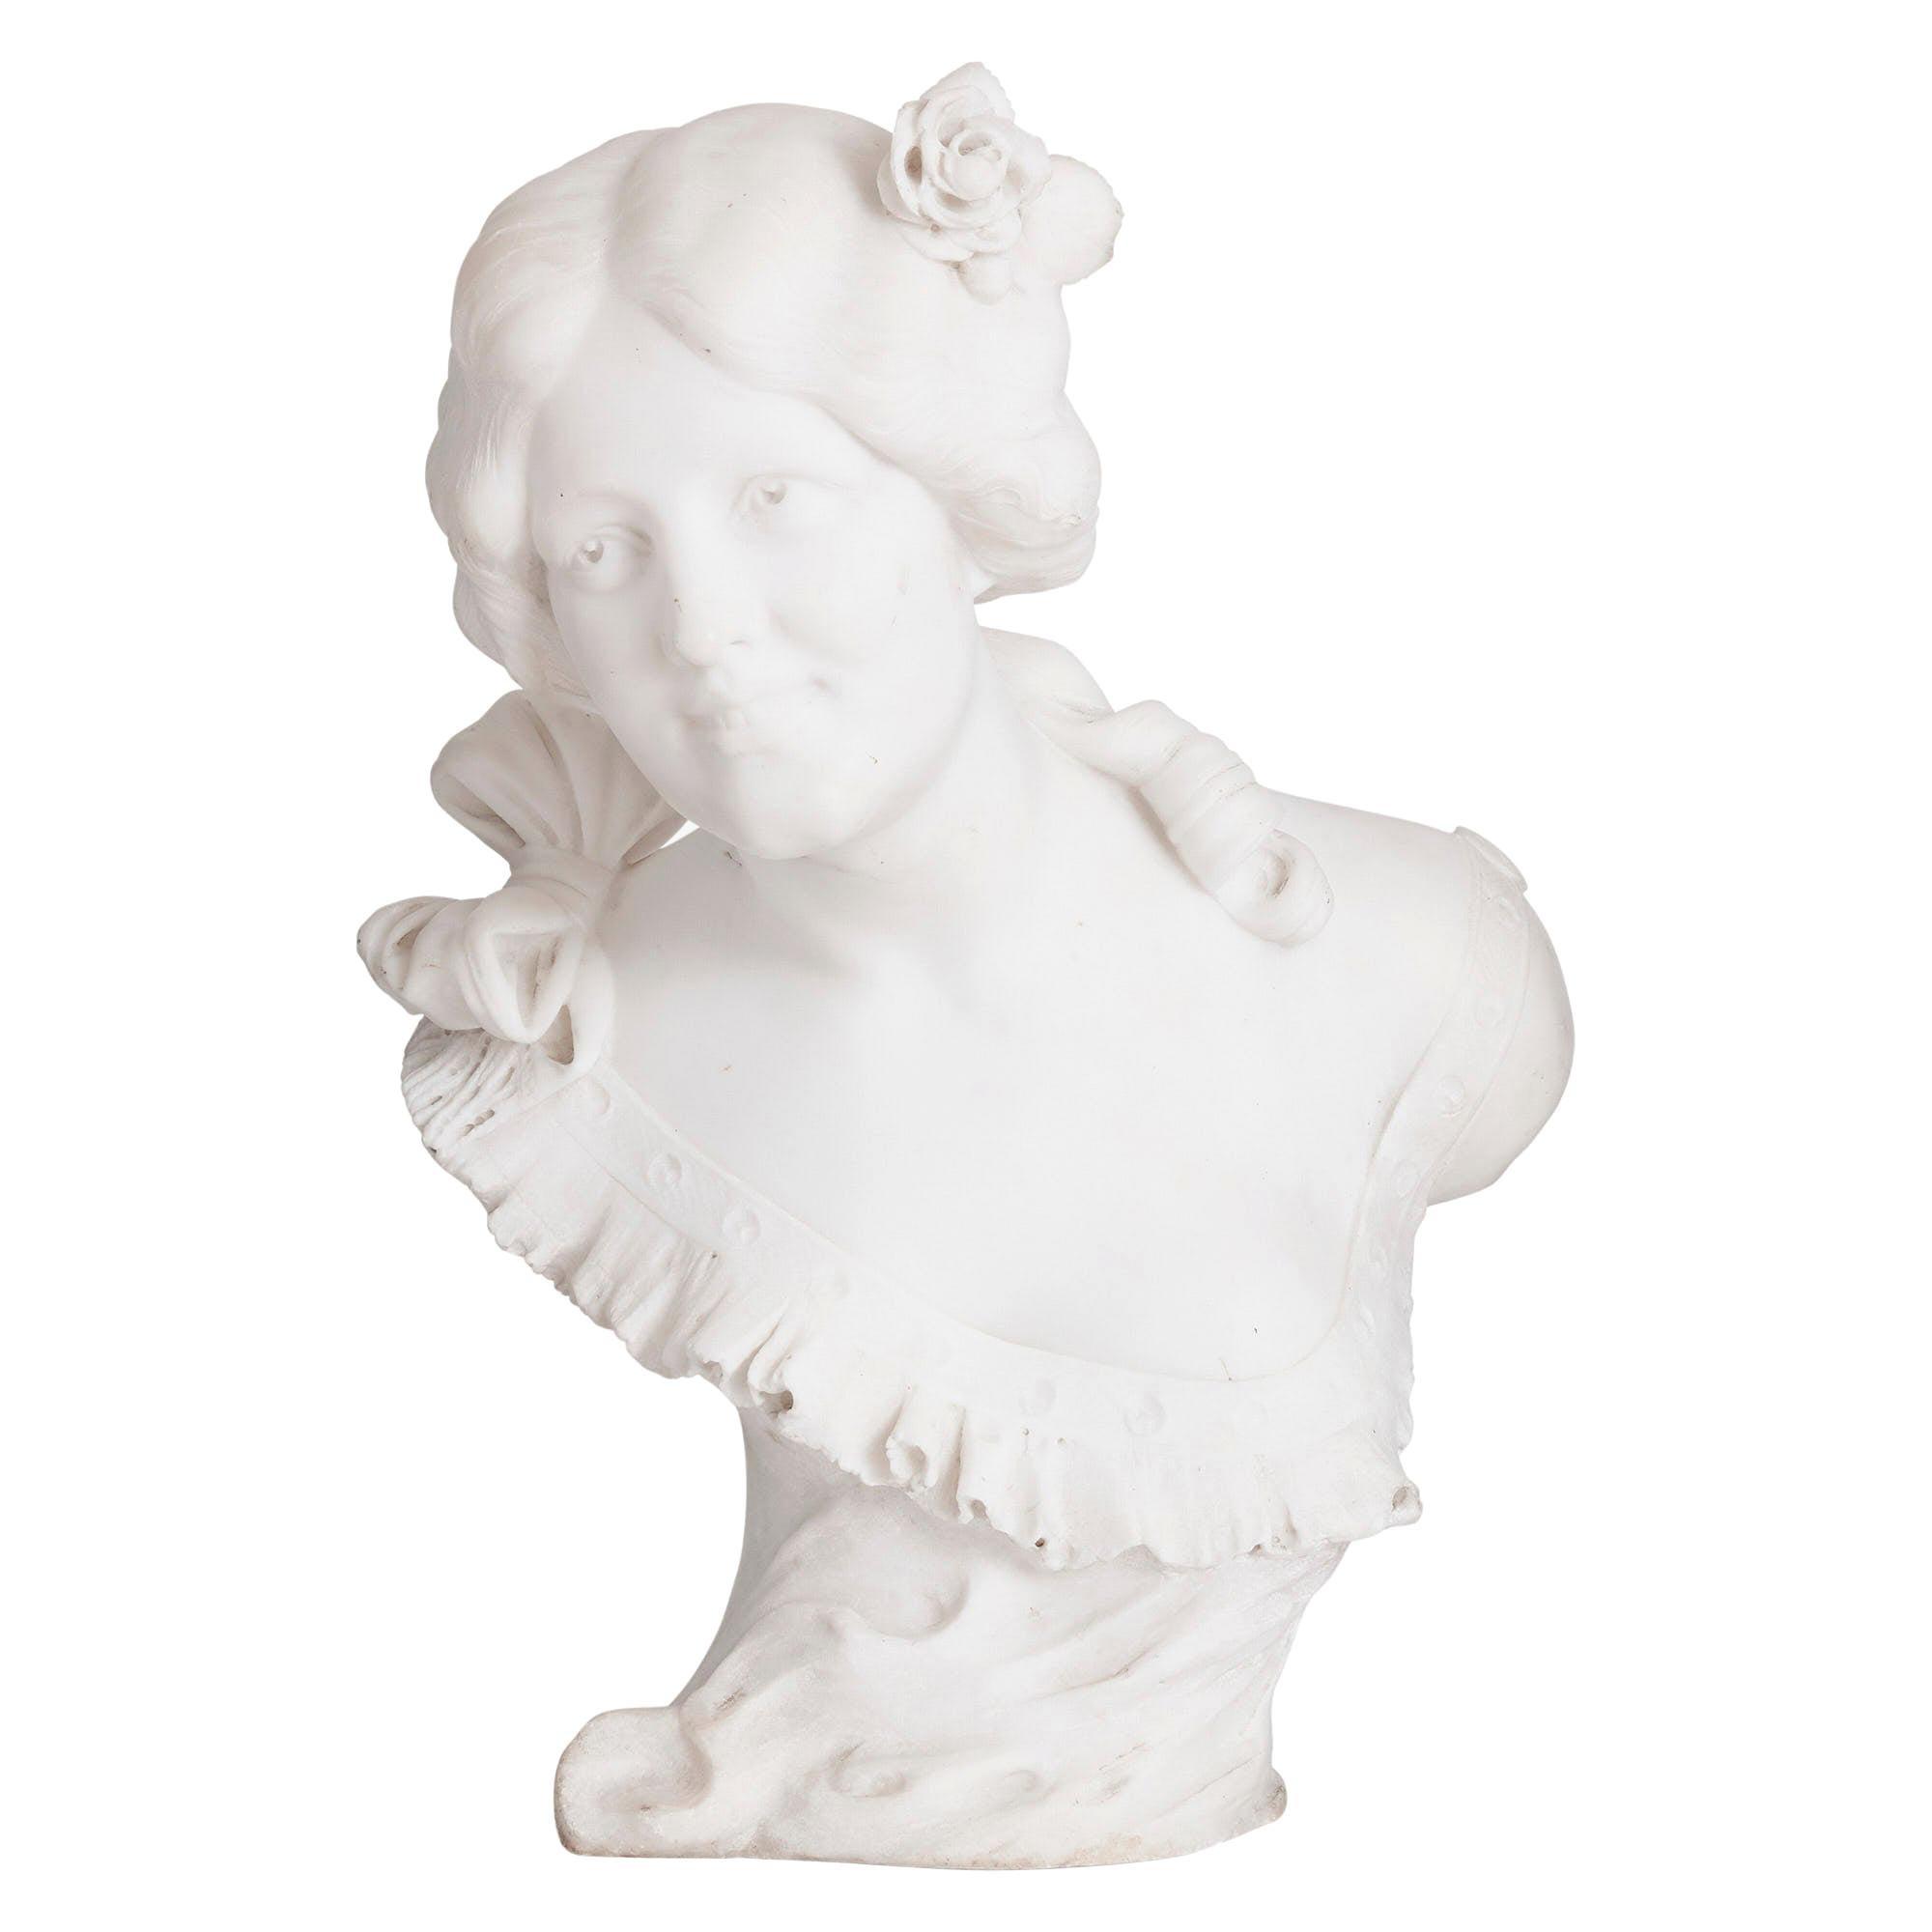 Italian Art Nouveau Style Sculpted Marble Bust by Pugi